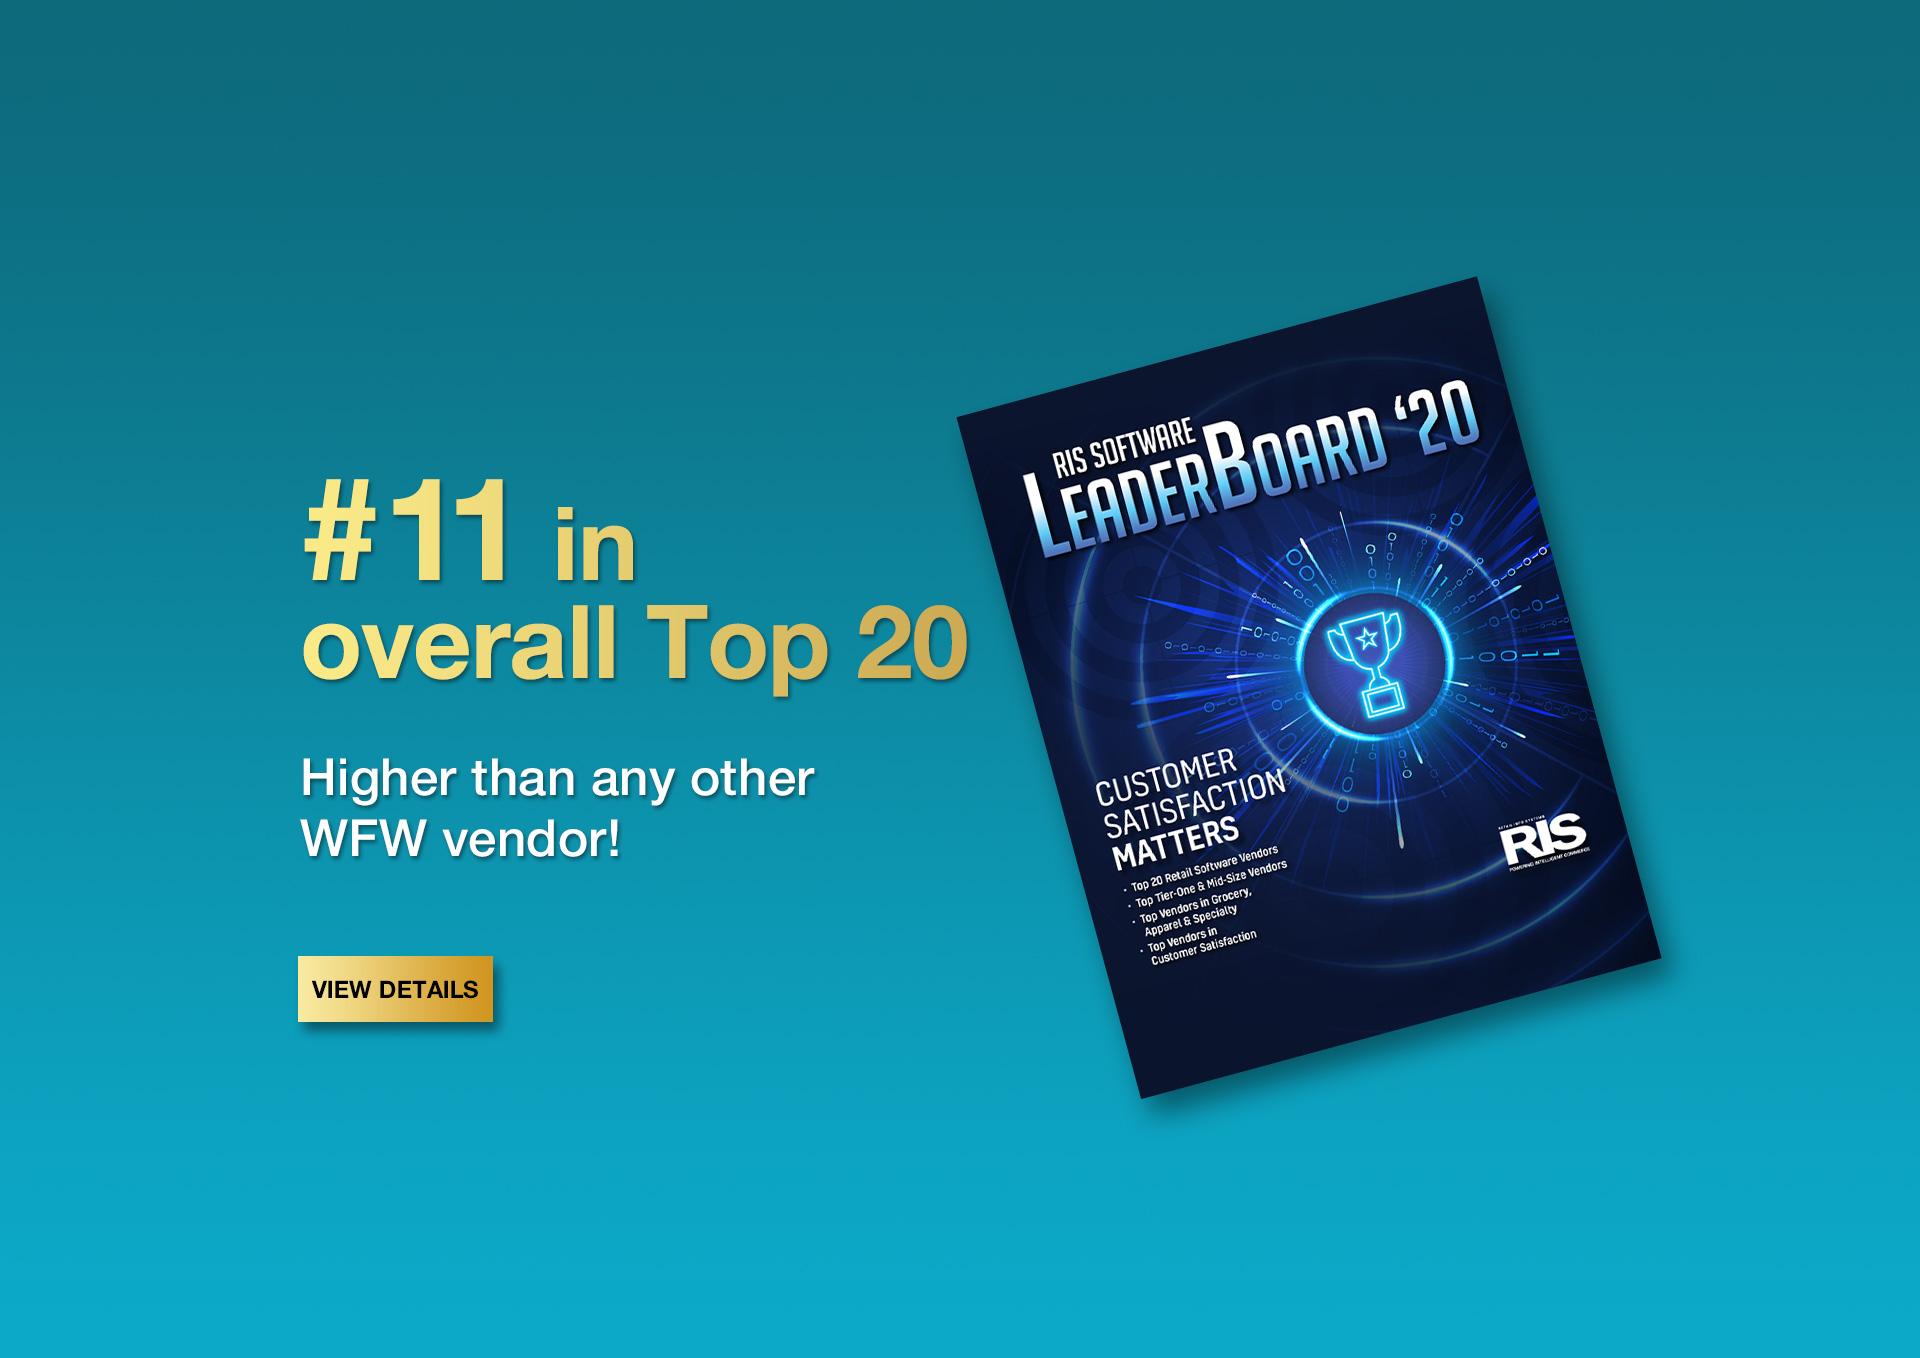 Logile RIS LeaderBoard 2020 Web Banner 11 Overall